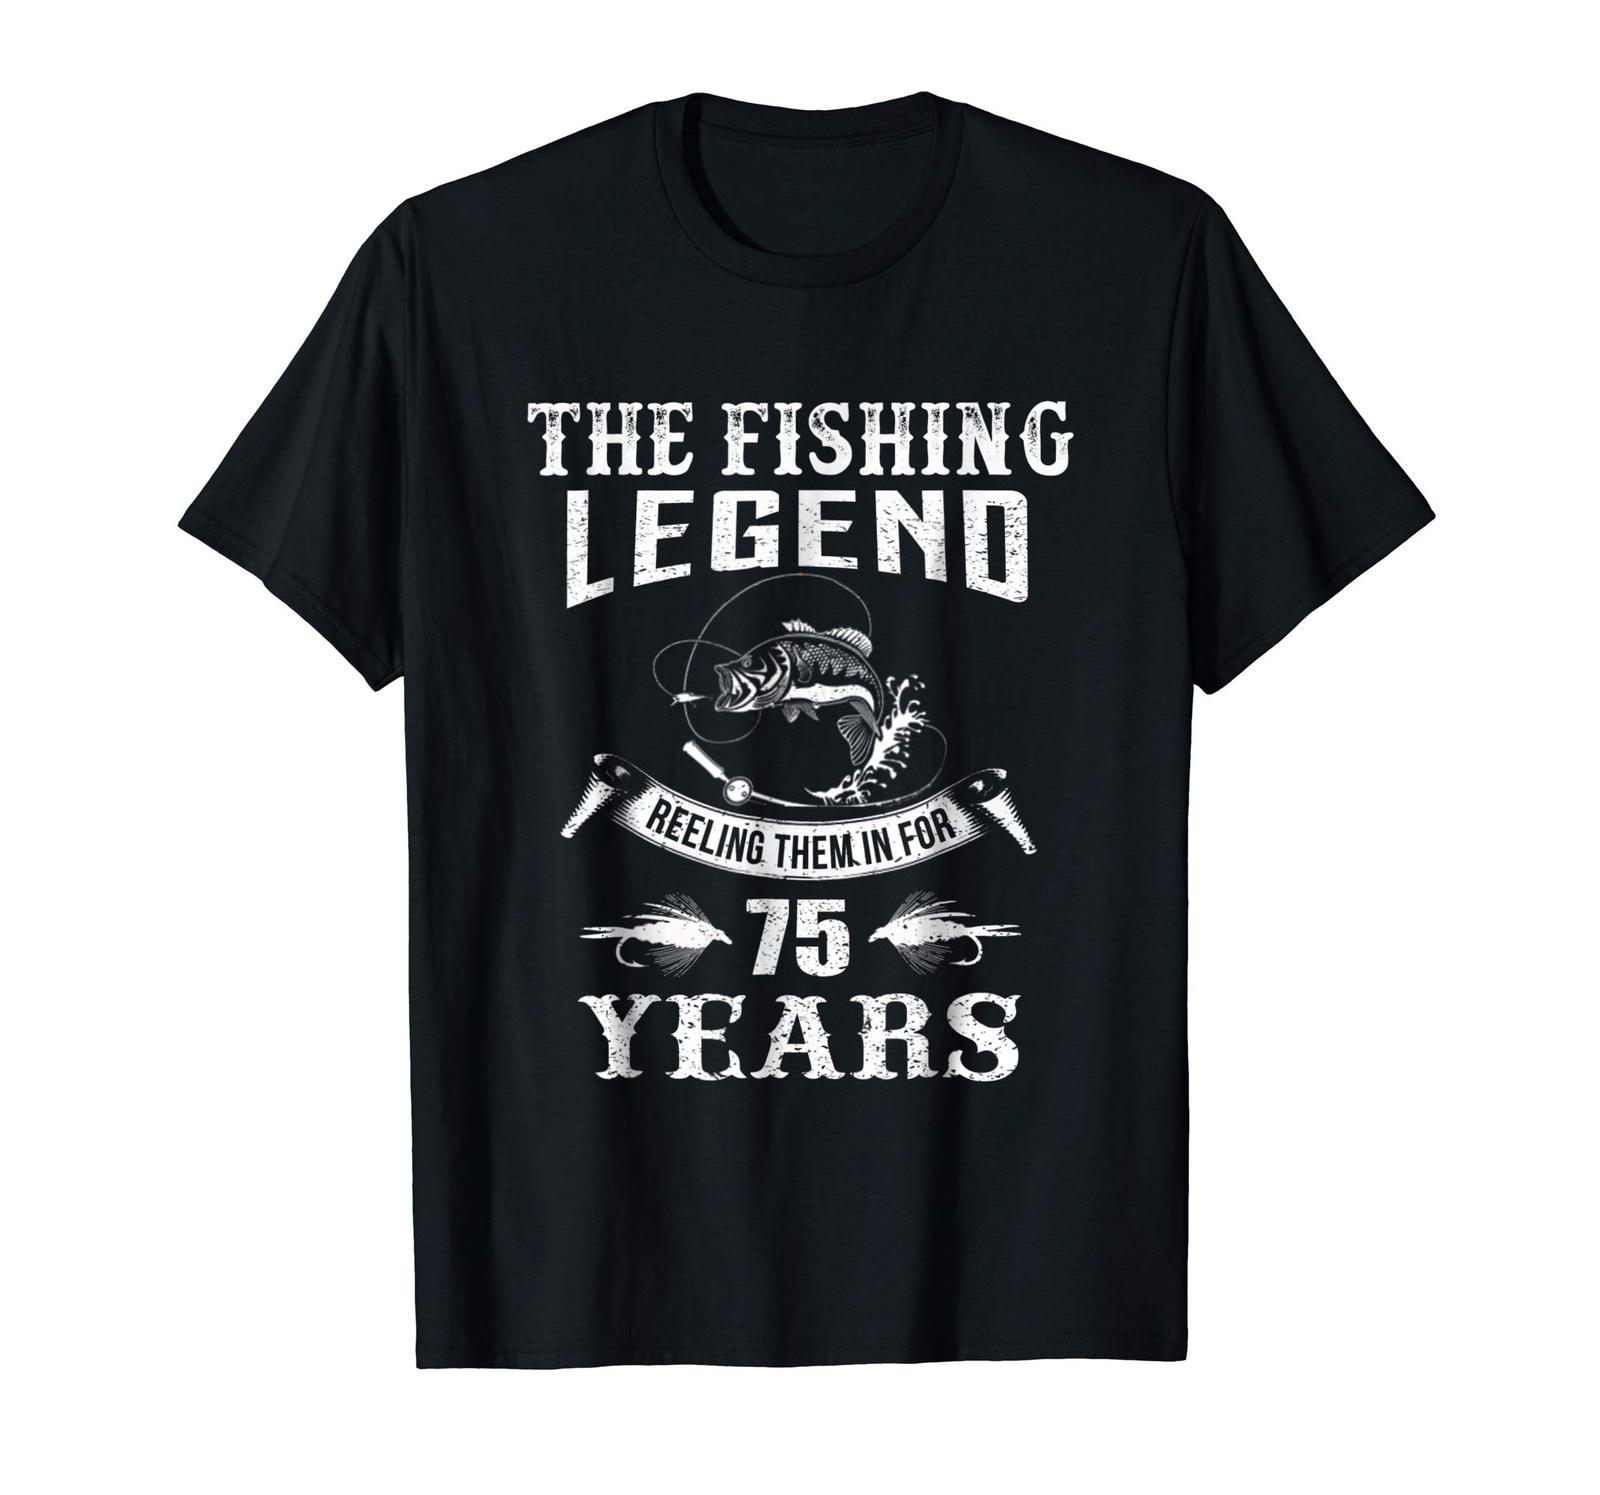 New Shirt -  Fishing Legend 75th Birthday Gifts Shirt for Fisherman Men image 4